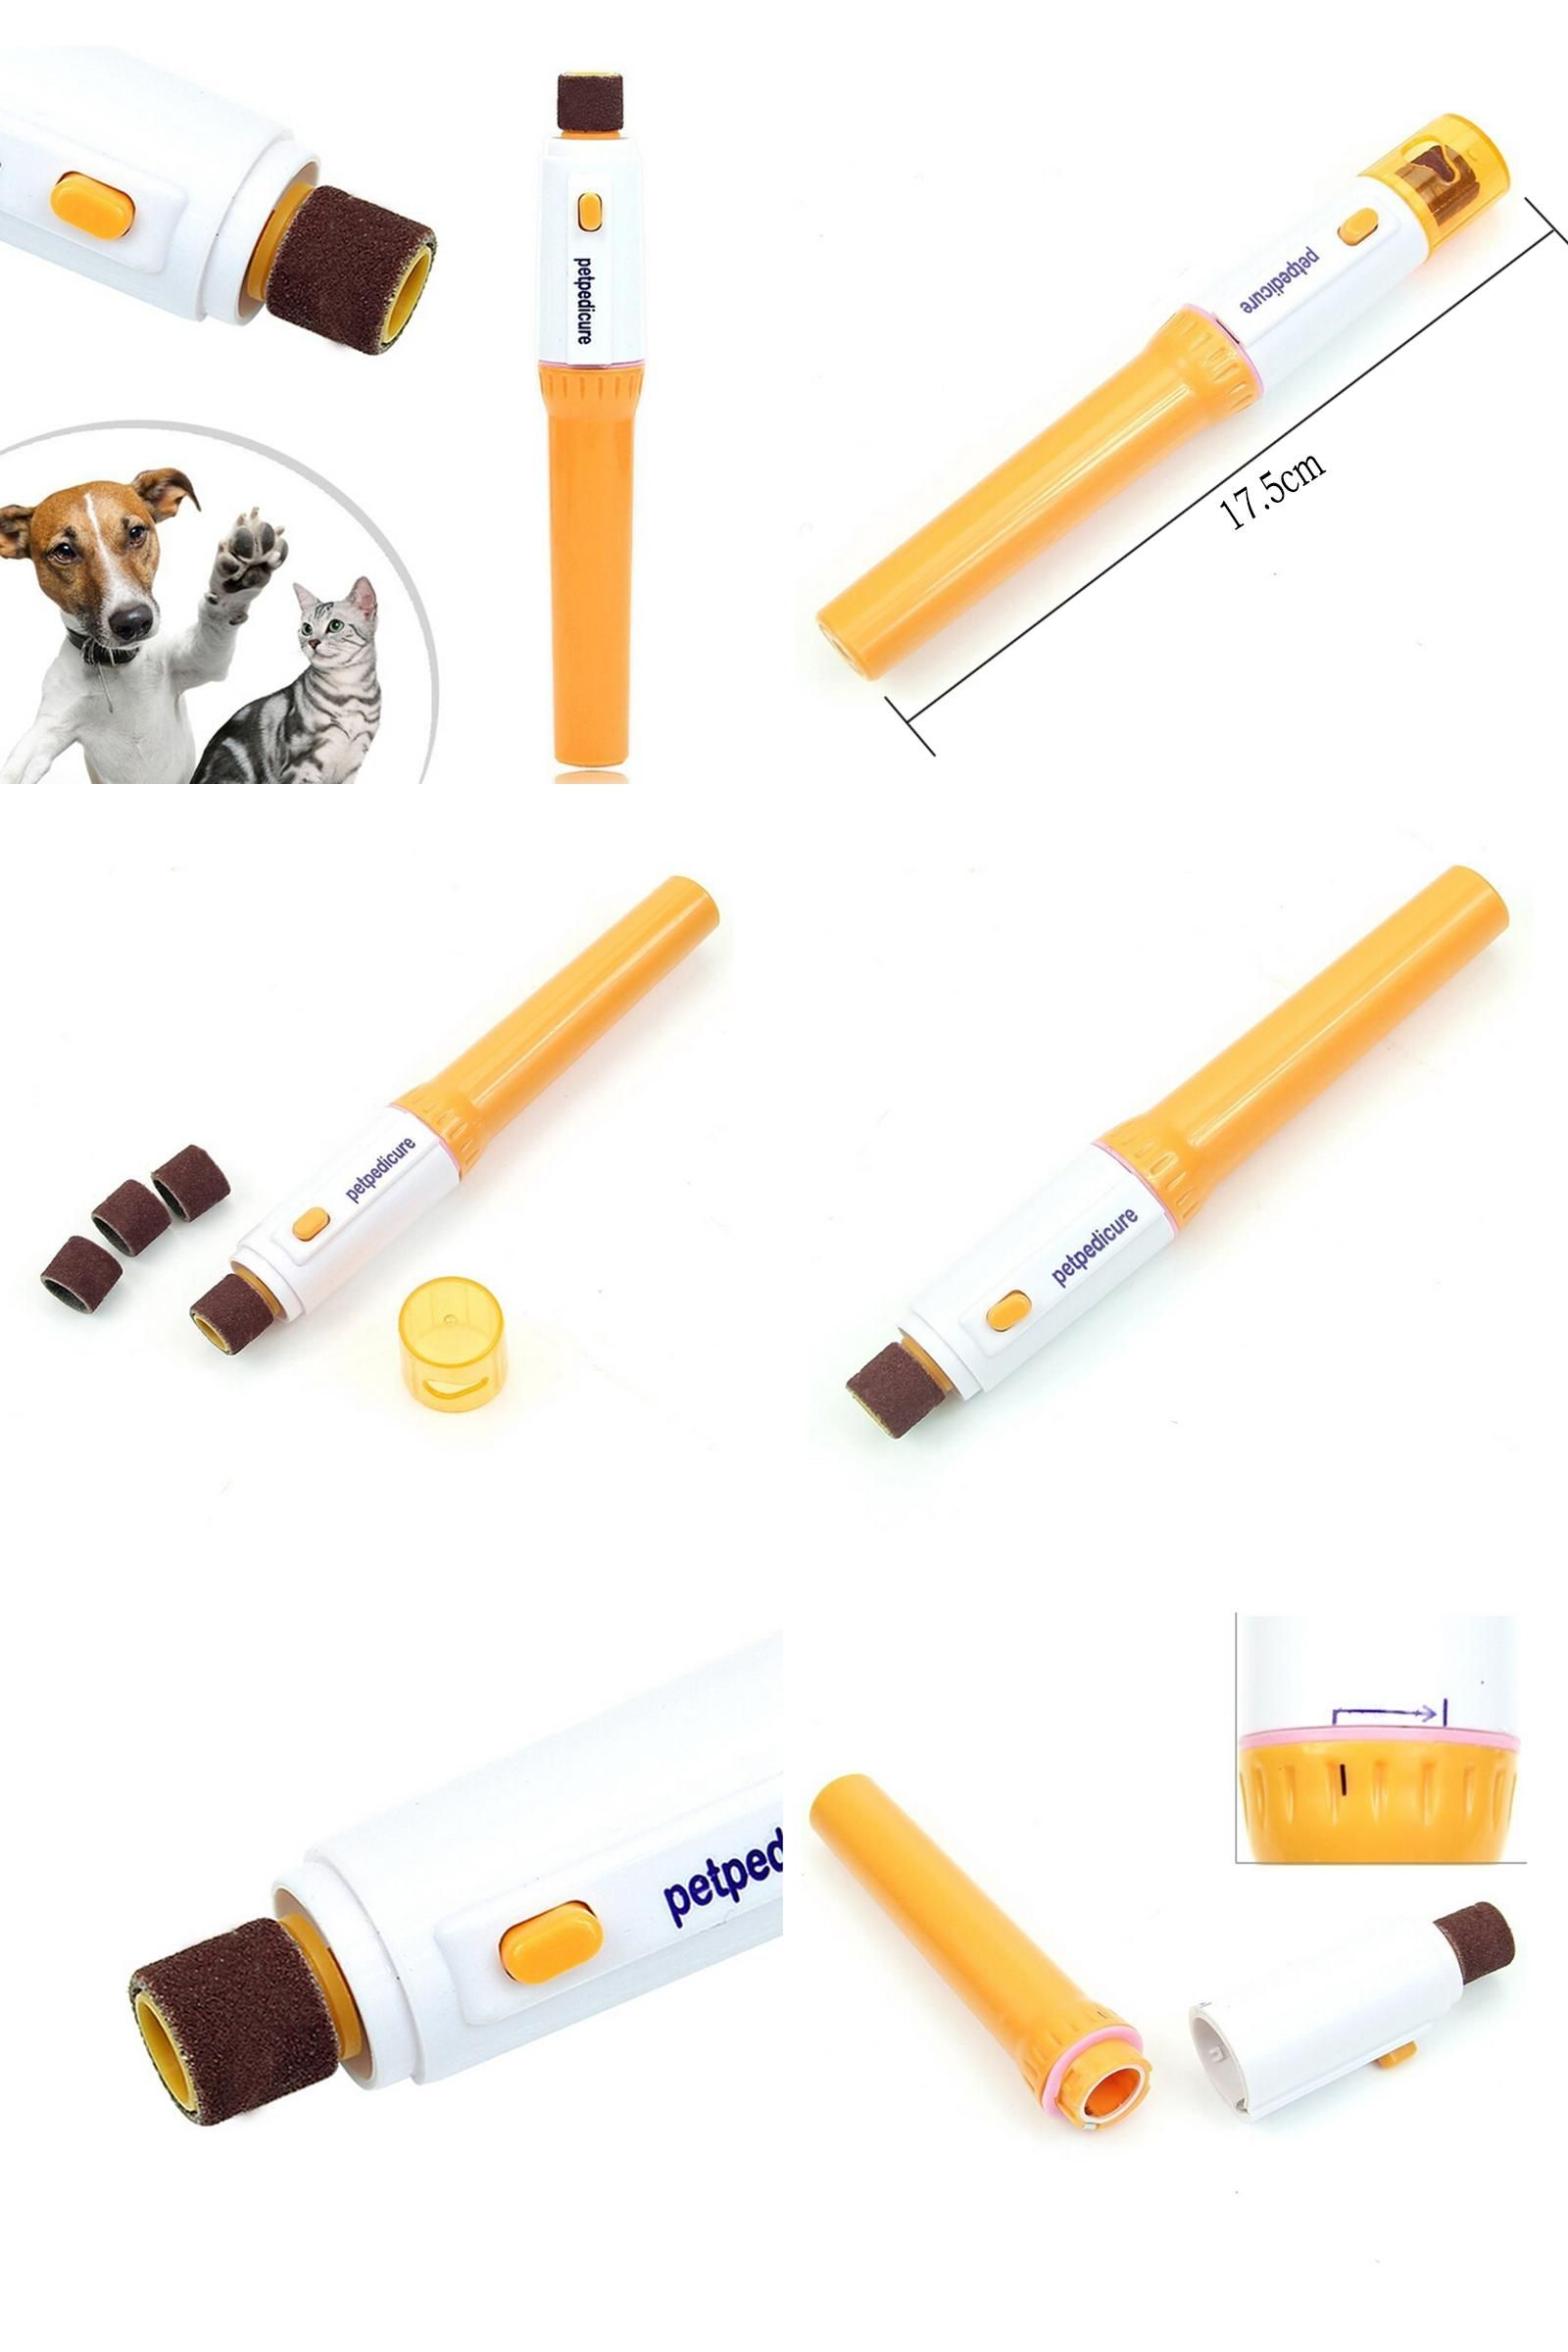 Visit to Buy] Electric Pet Pedicure Nail Trimmer Pet Nail Tools